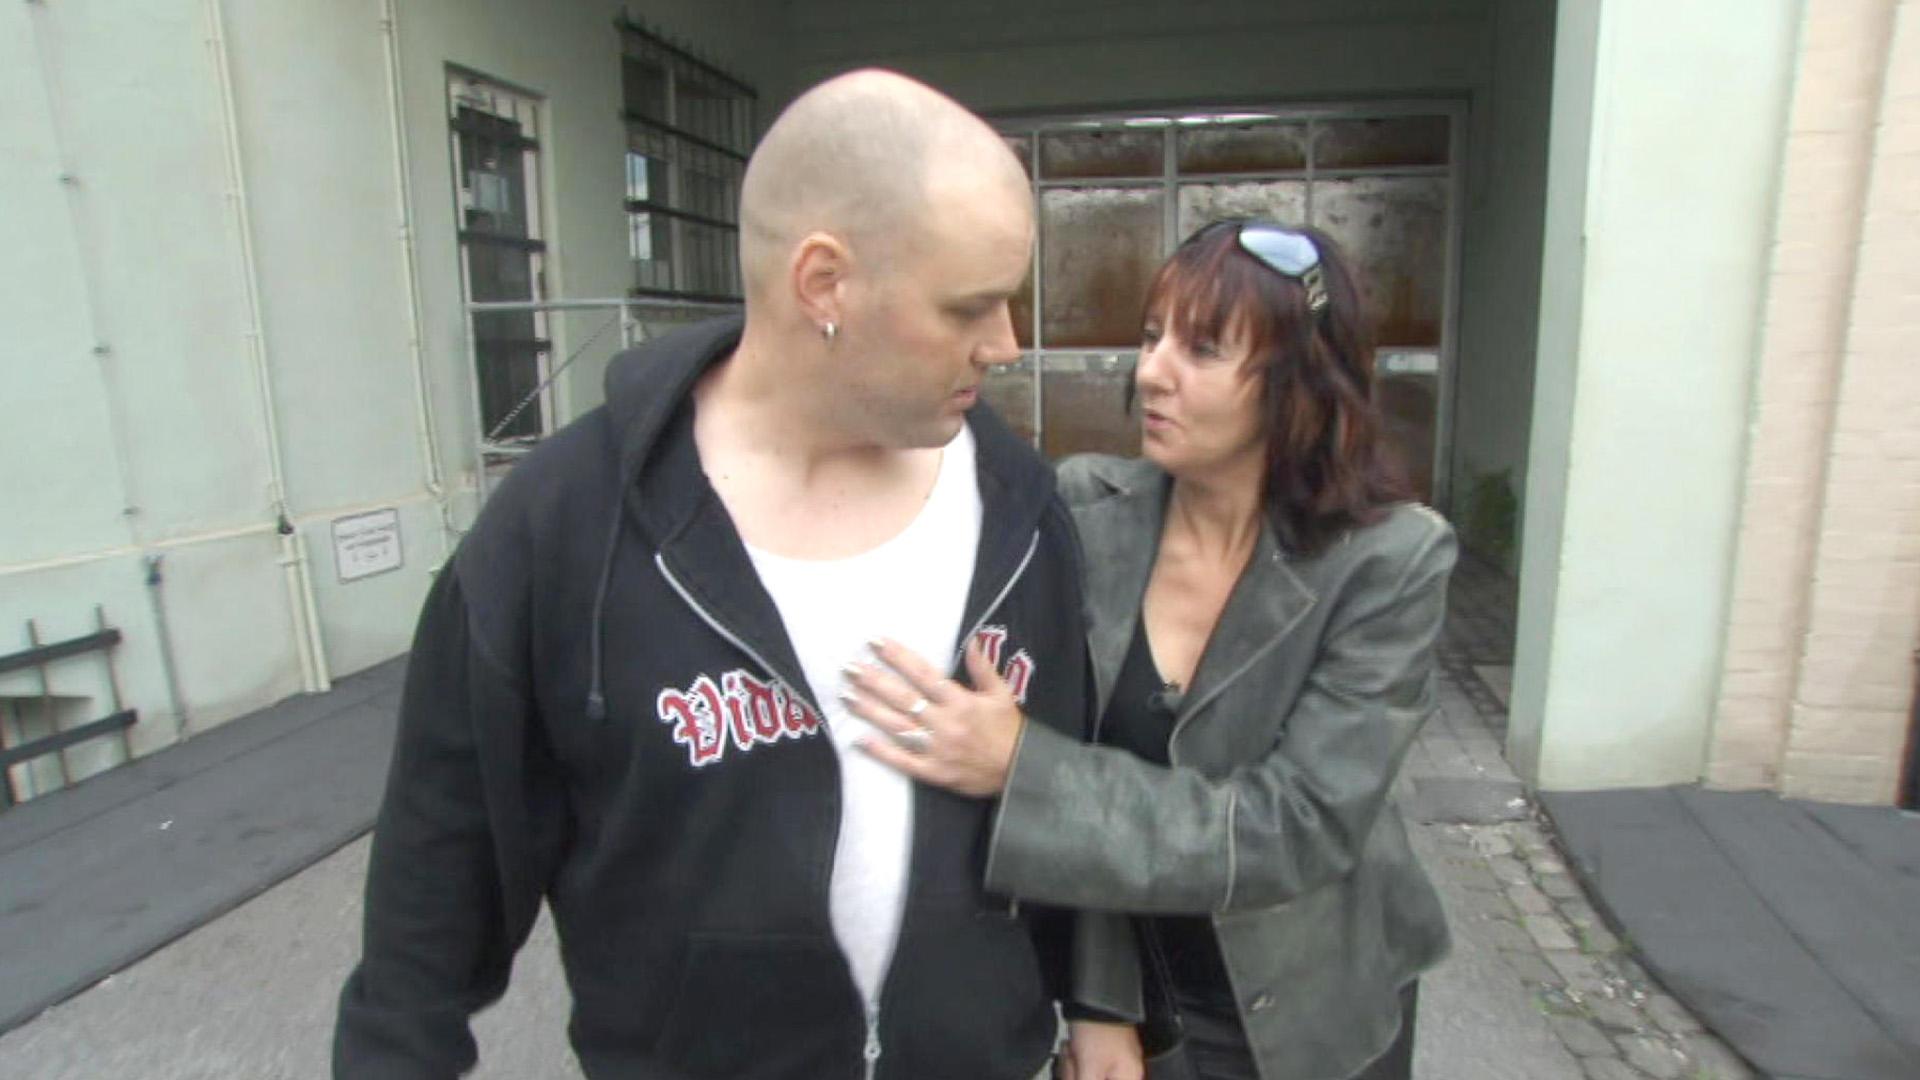 Mutter ist Straftäter hörig   Folge 57